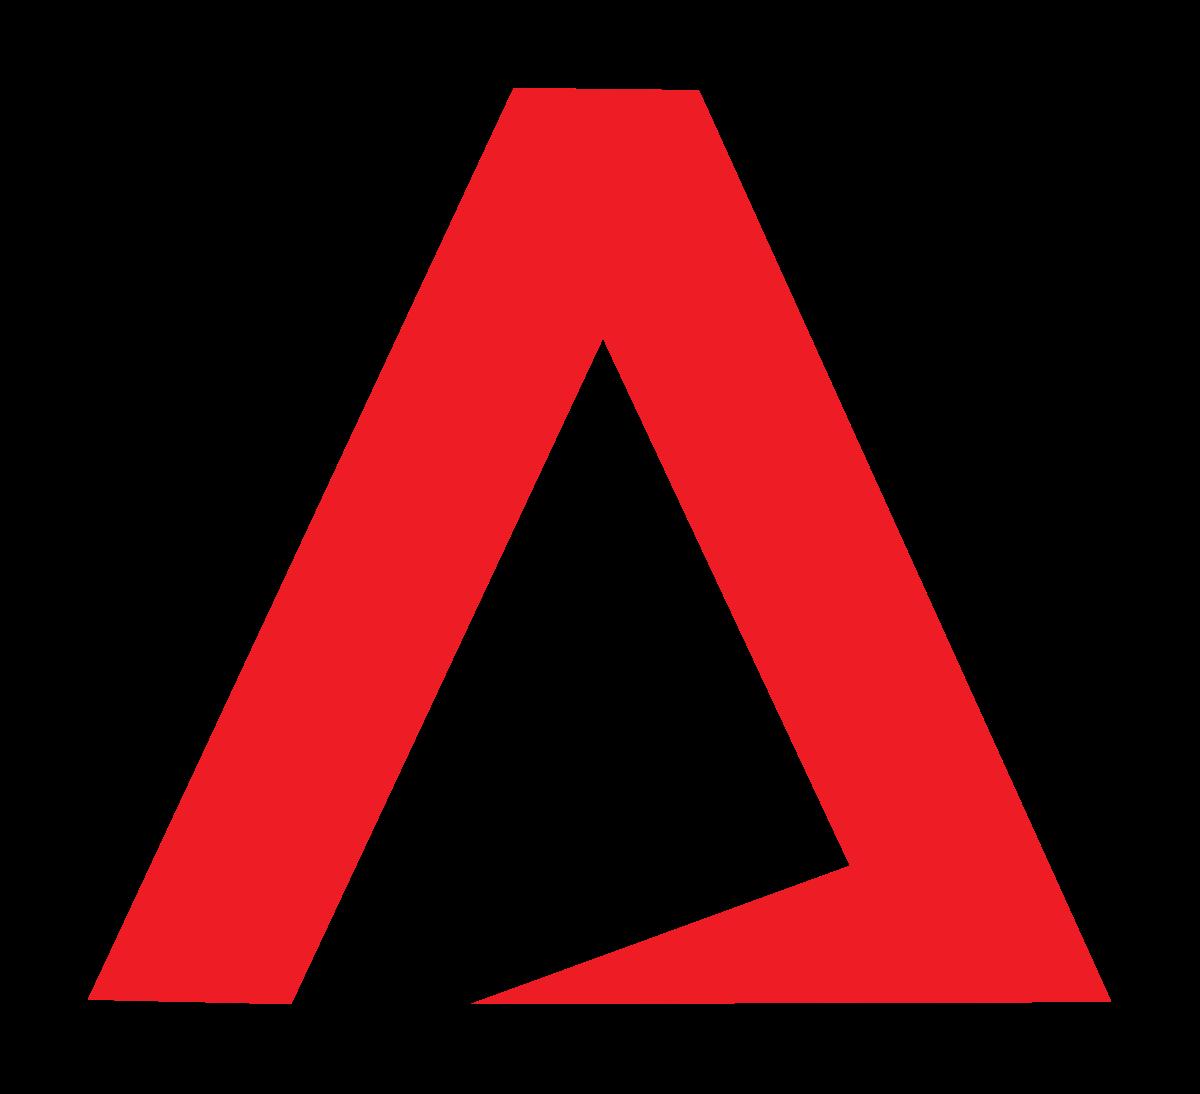 RSS feeds source logo Channel NewsAsia